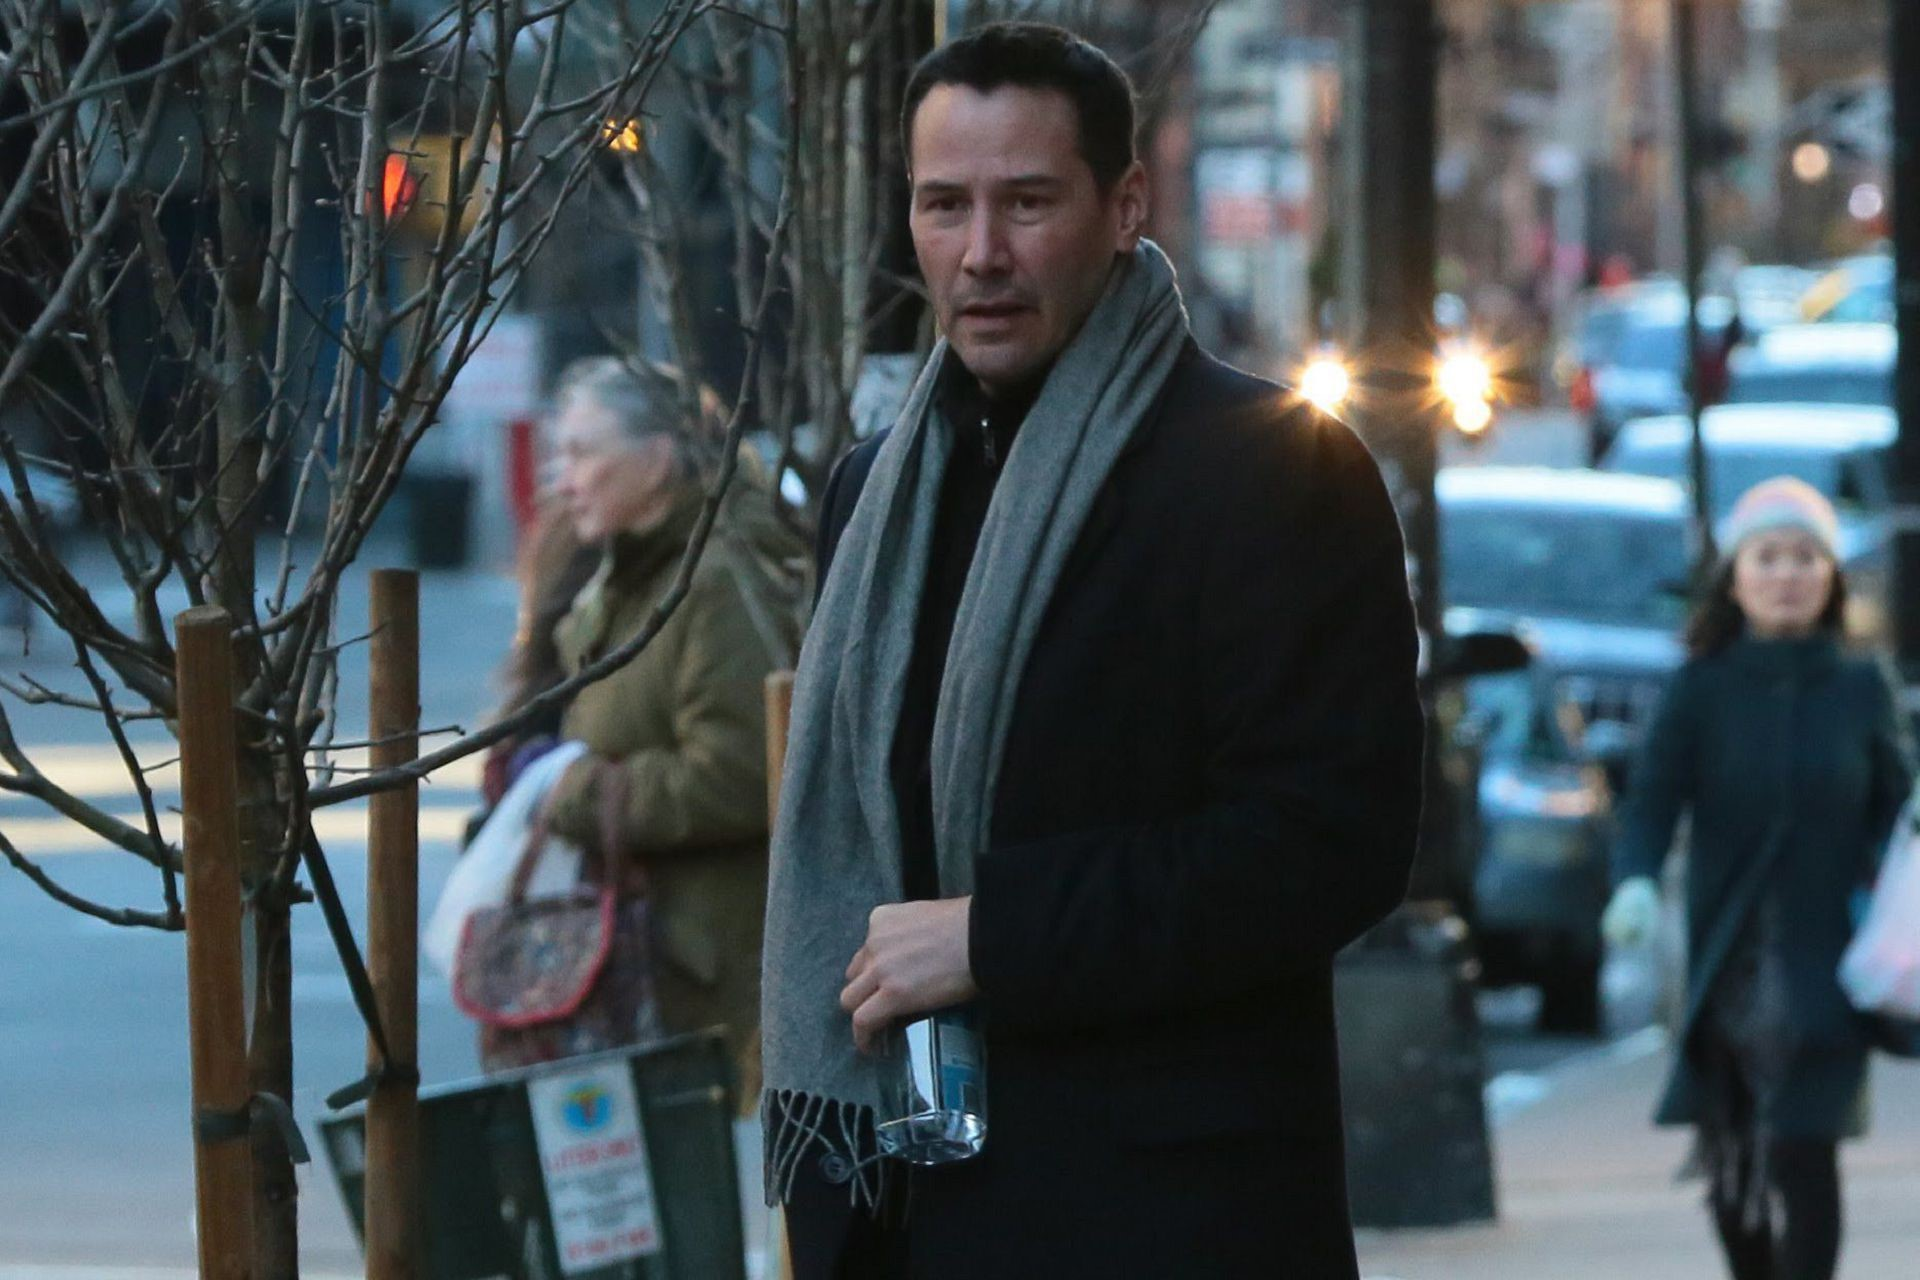 Keanu Reeves Background images